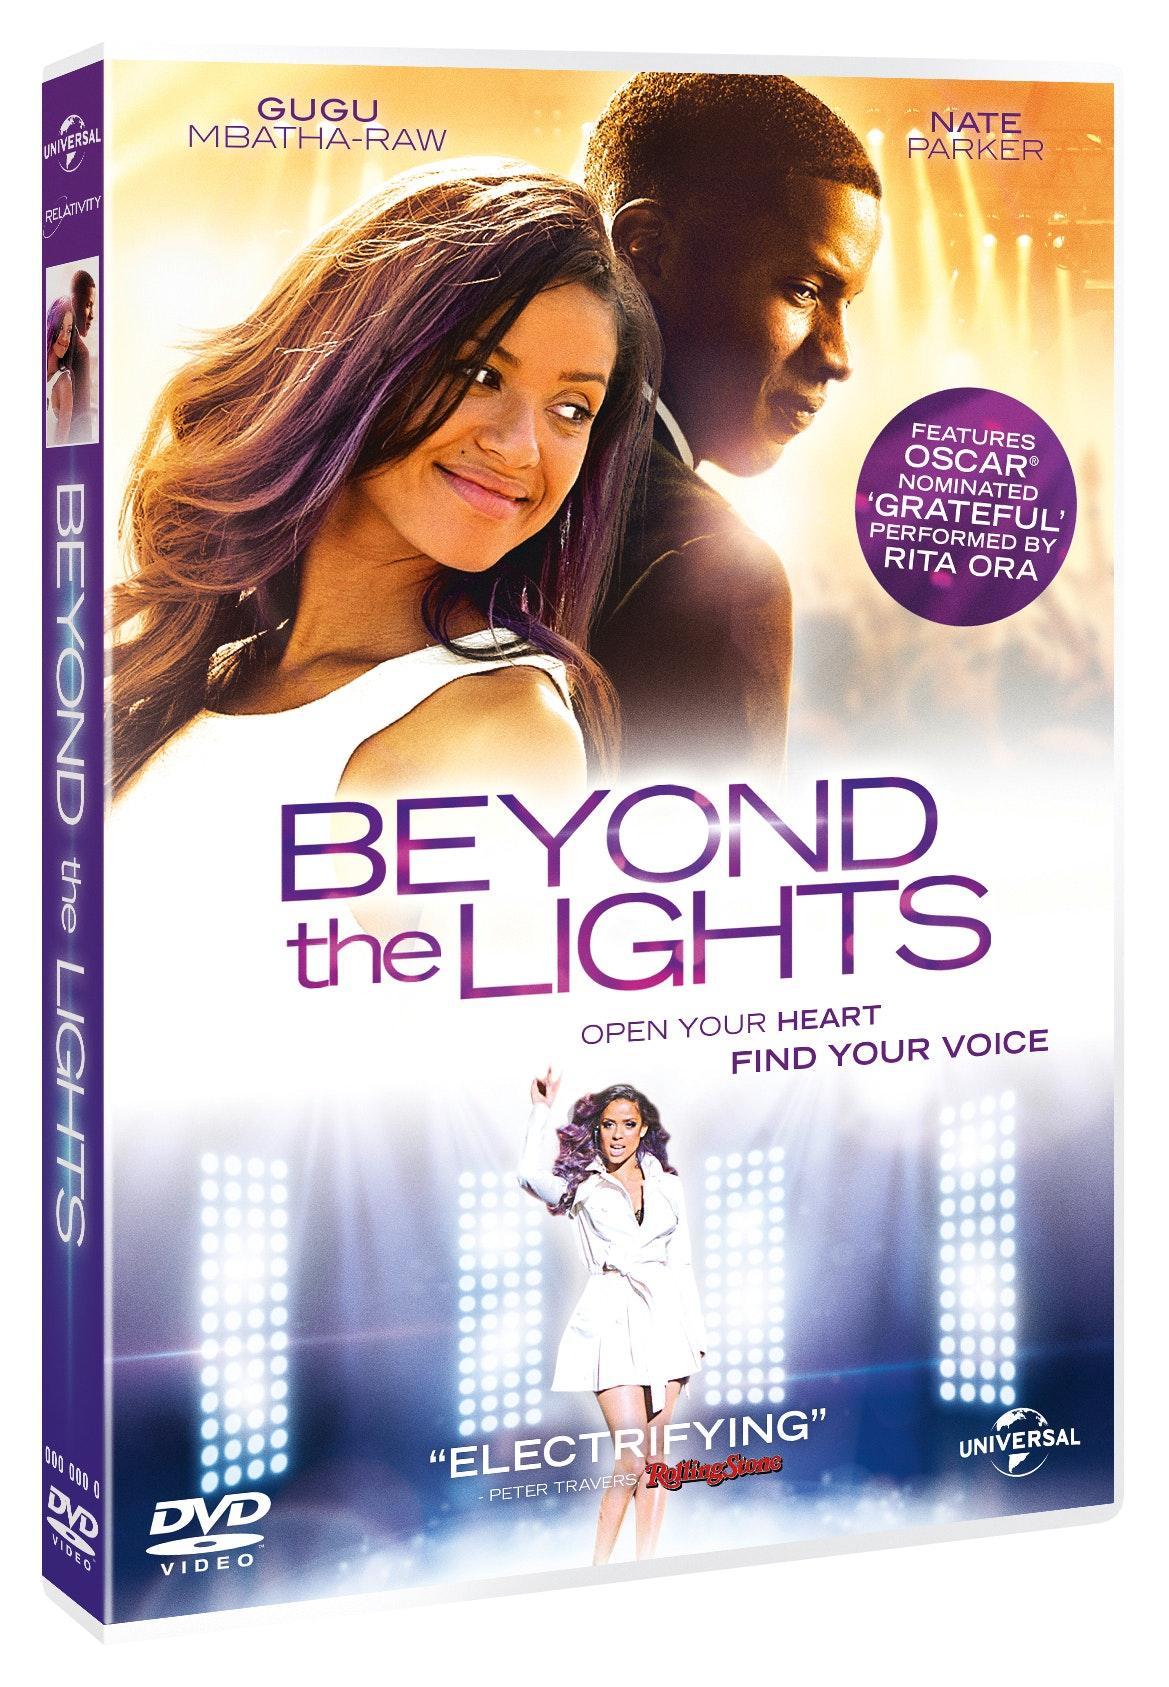 Beyond the Lights DVD! sweepstakes